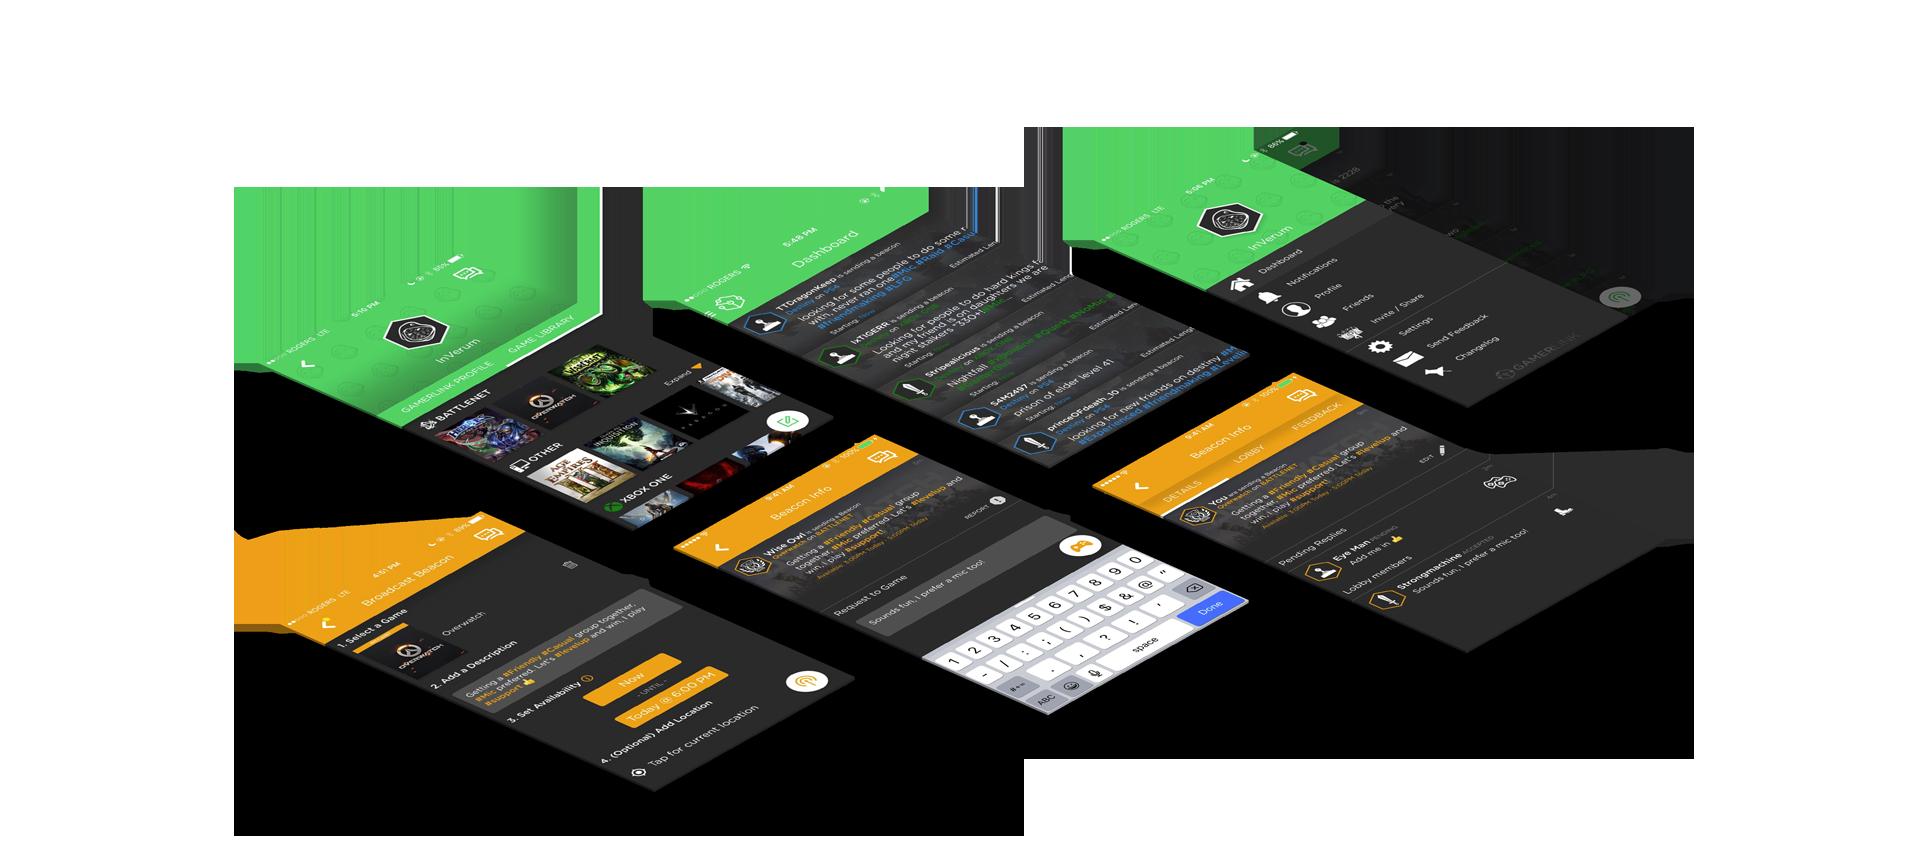 Download The Best Rainbow Six Siege LFG App